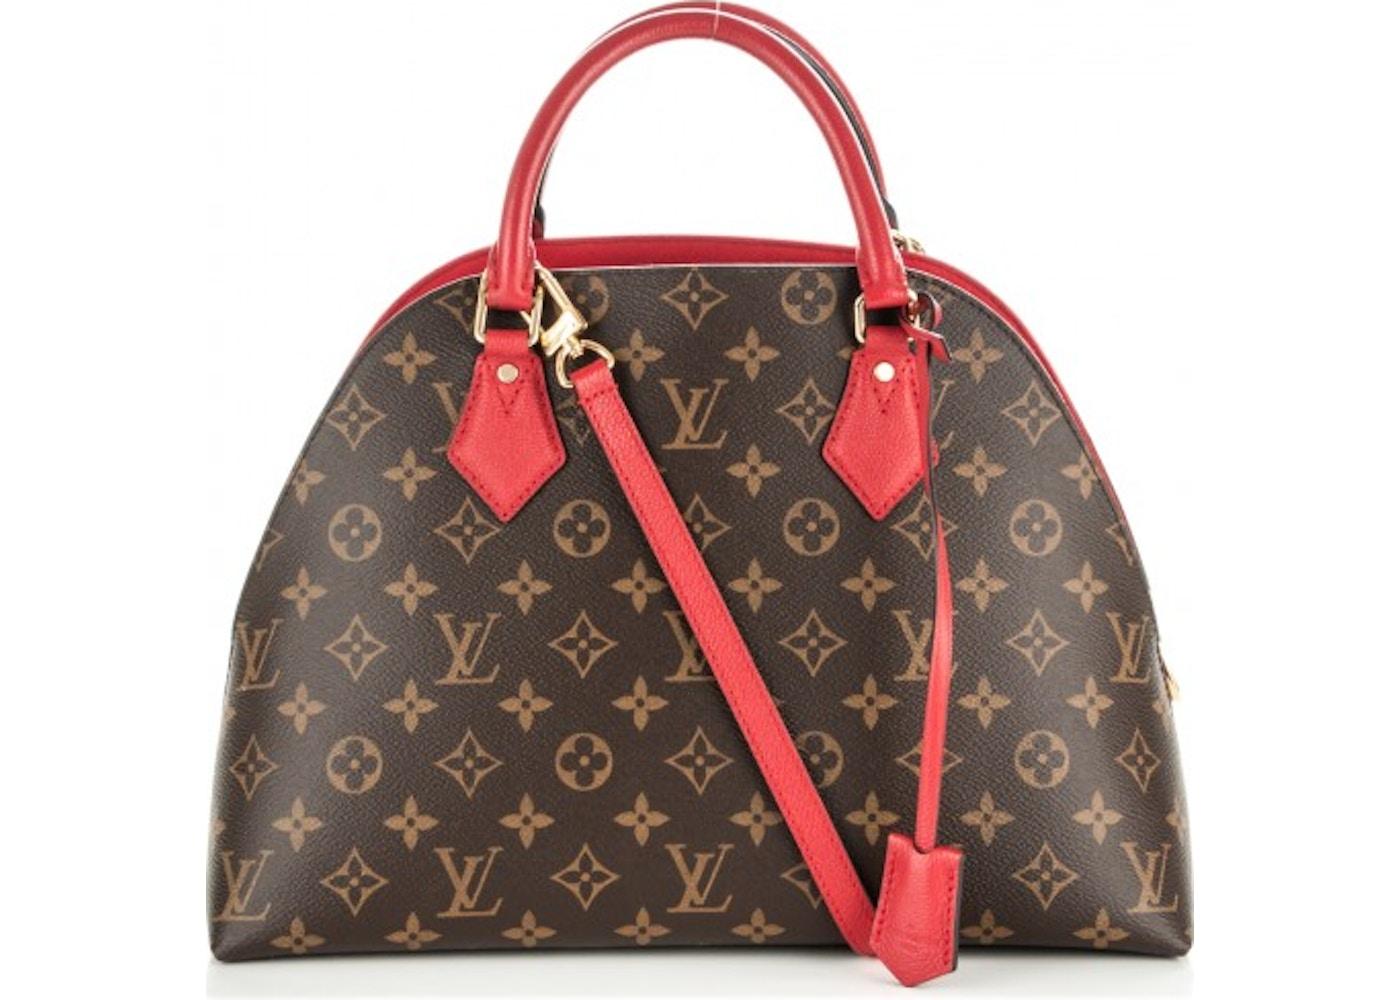 e94ece97aaa1 Louis Vuitton Crossbody Alma B N B Monogram With Accessories ...